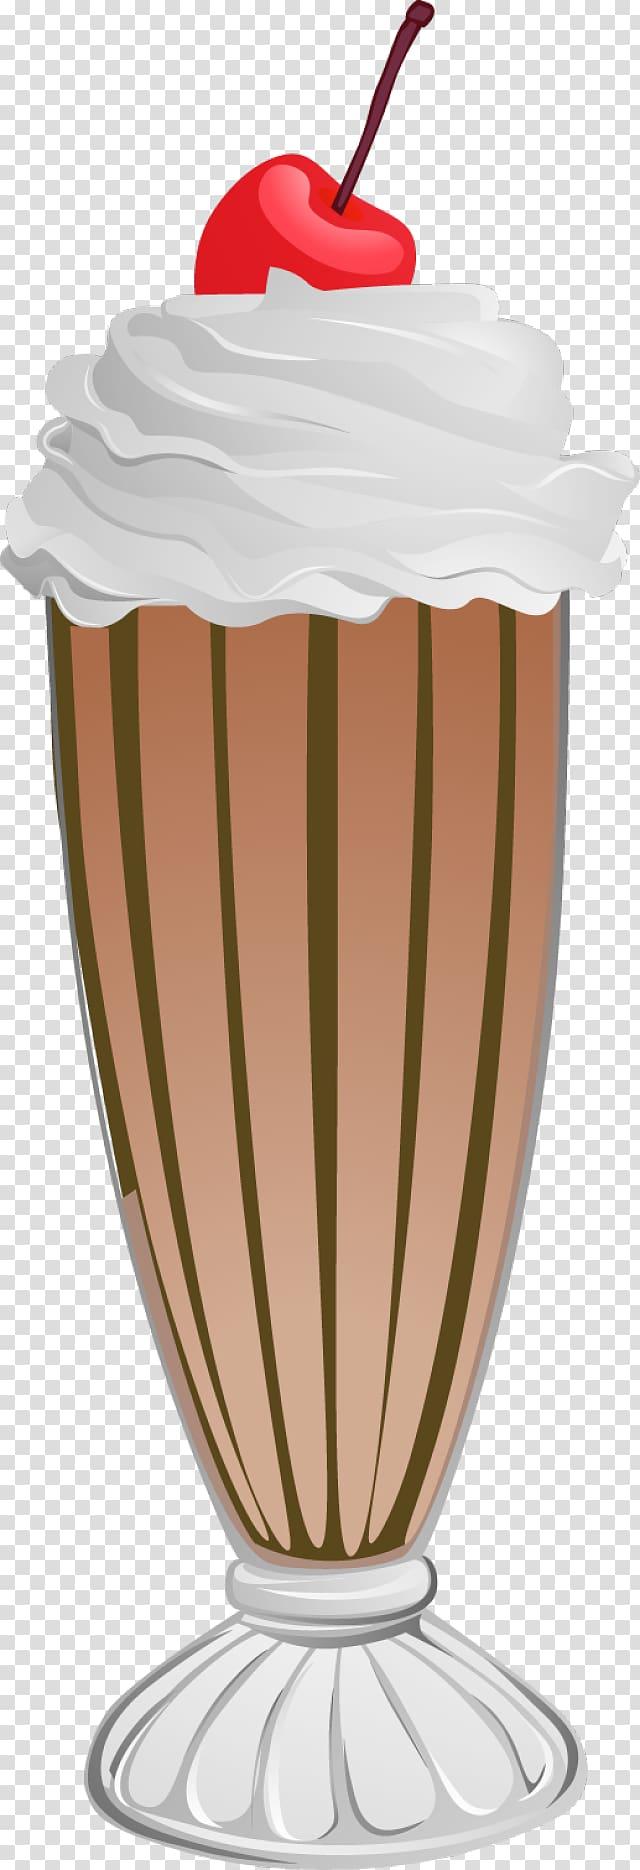 Chocolate milkshake clipart picture transparent Ice cream Milkshake Chocolate pudding , Chocolate Pudding ... picture transparent